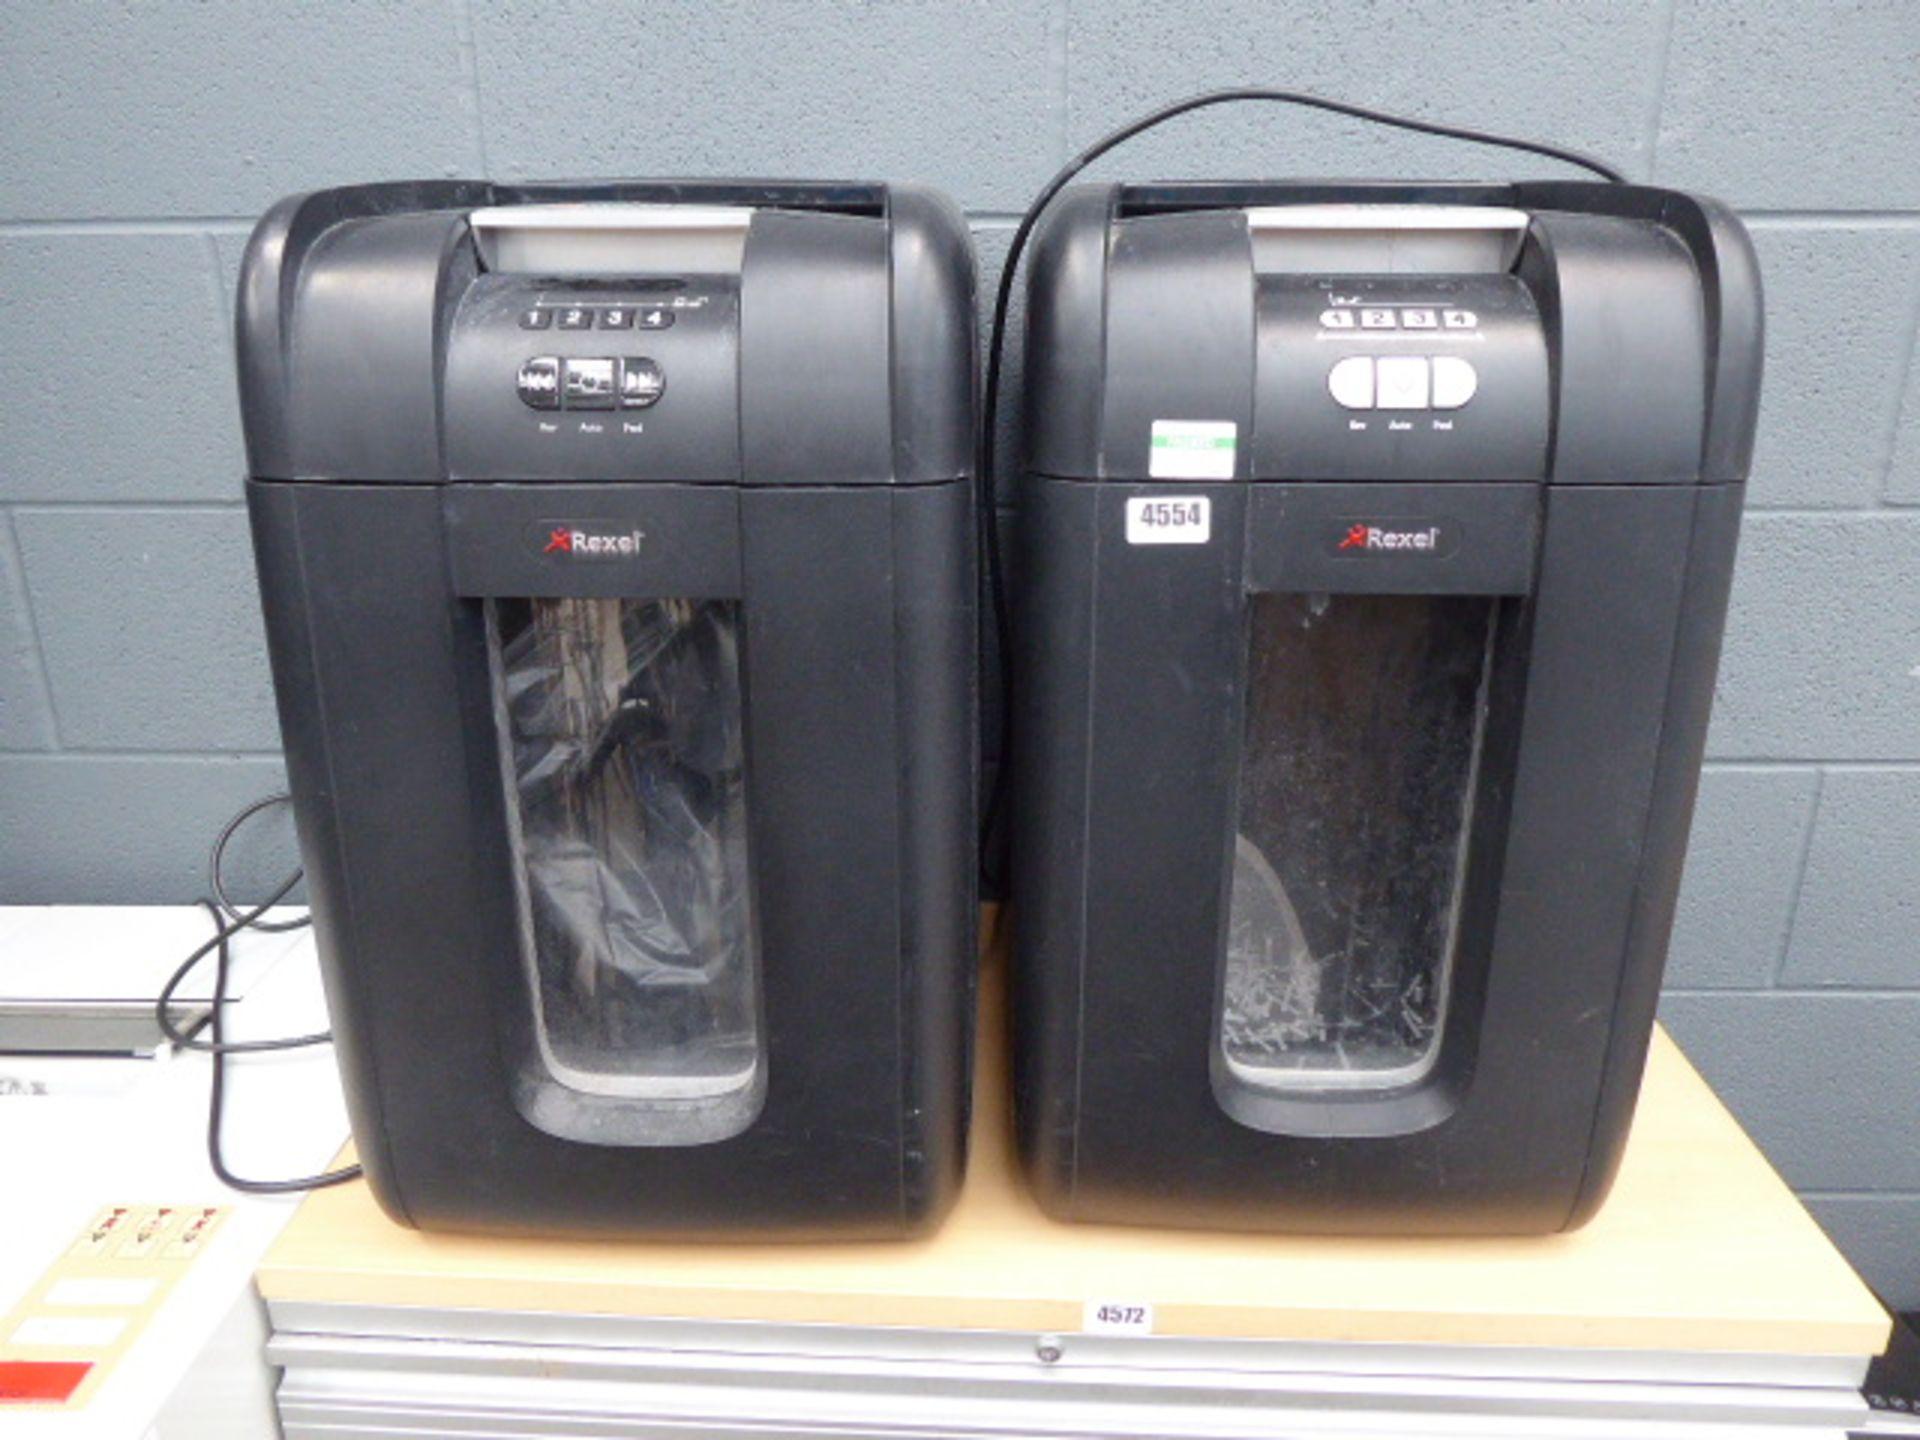 Lot 4554 - 2 large Rexel shredders